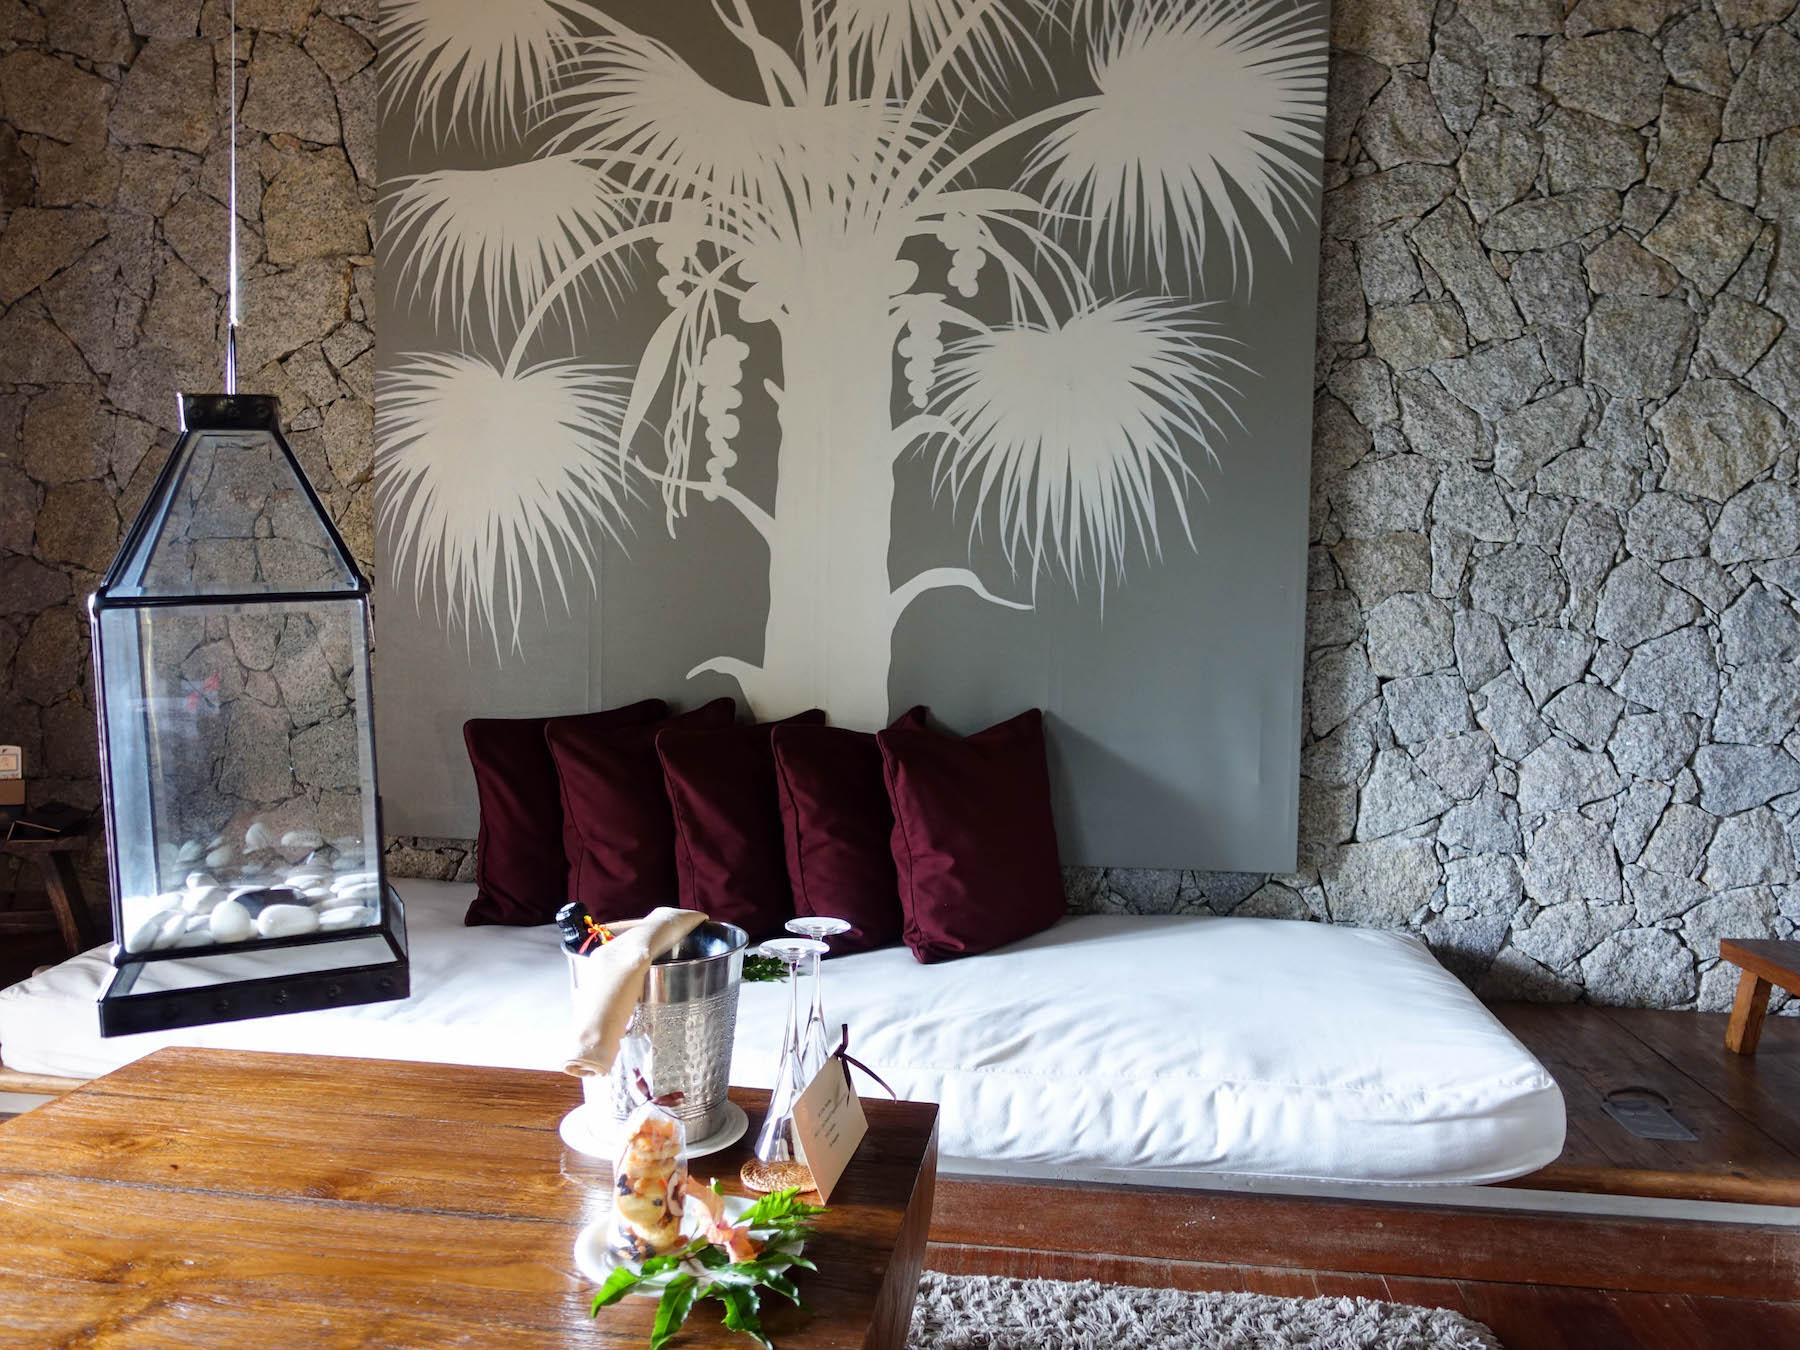 suelovesnyc_seychellen_hotel_auf_la_digue_domaine_de_lorangeraie_orangeraie_hillside_room